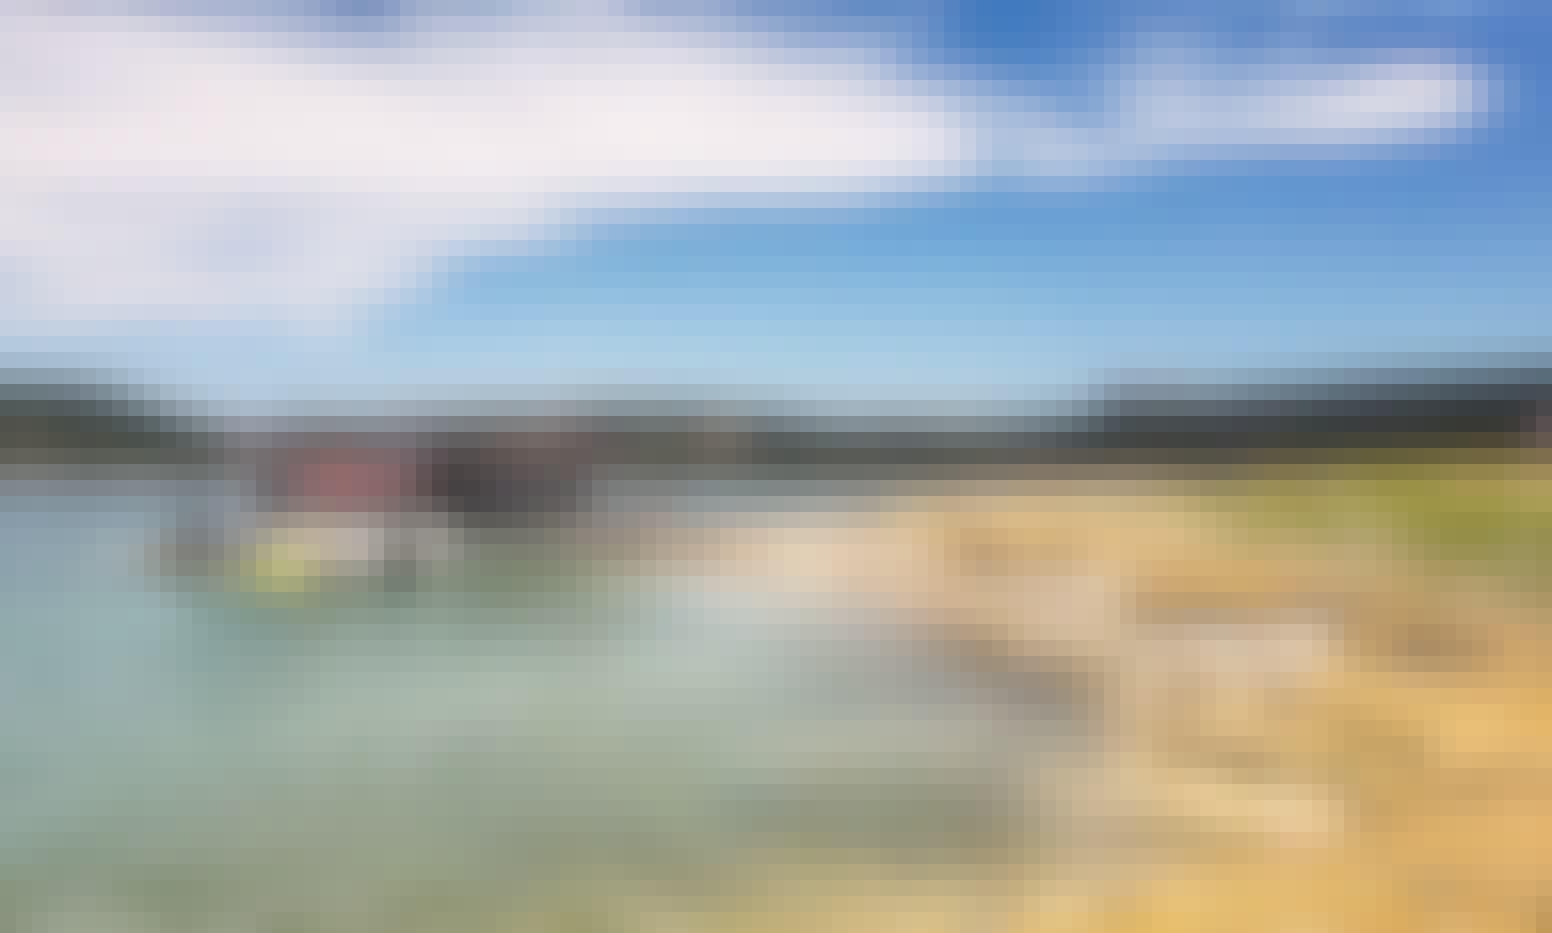 55' Skipperliner Houseboat for 50 people on Hatter Cove